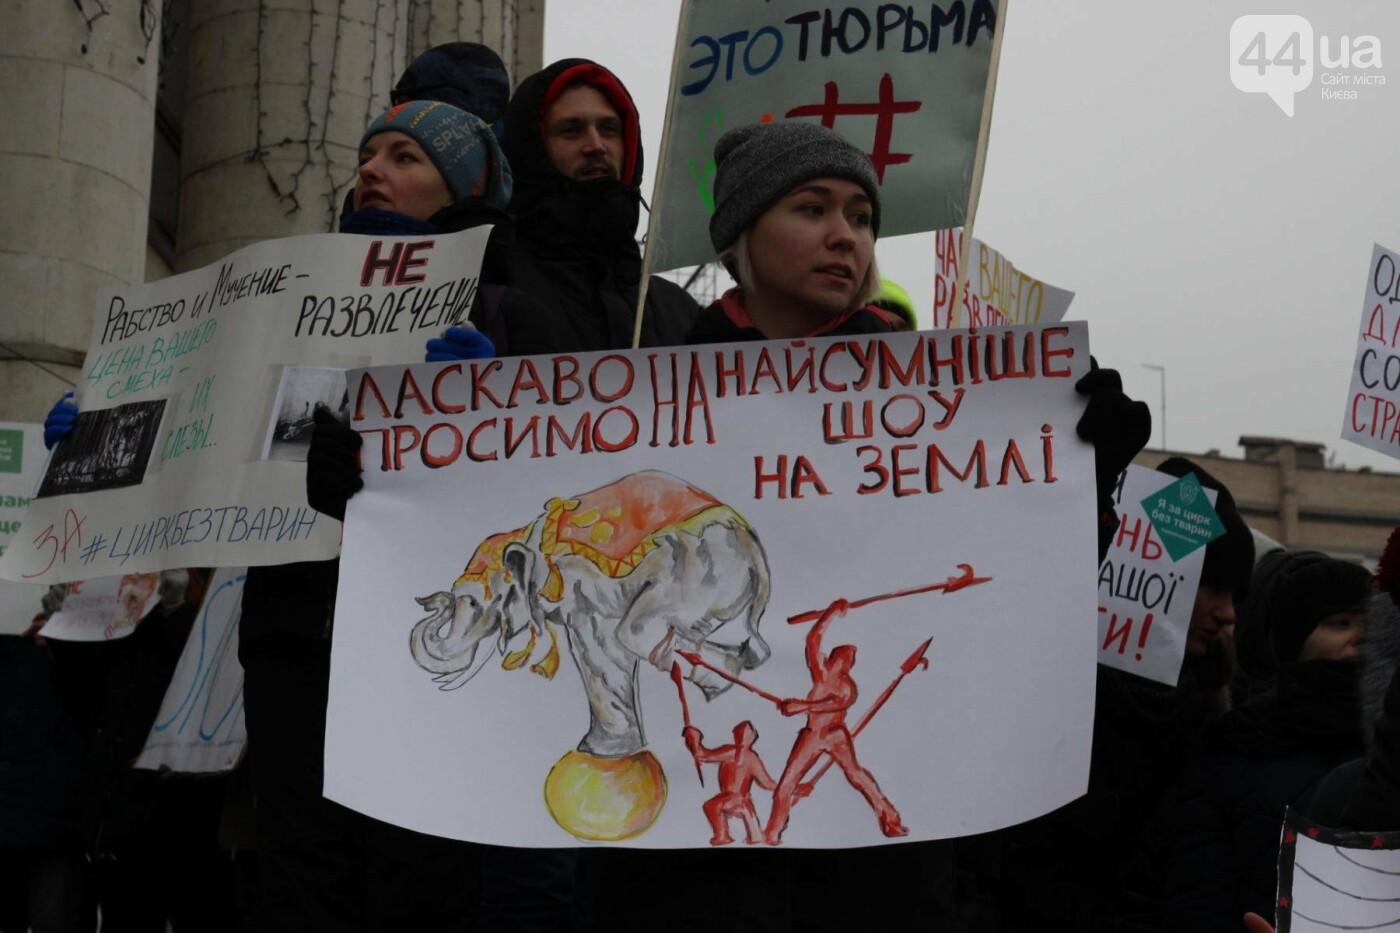 Цирк без животных: как в Киеве прошла акция протеста, фото-28